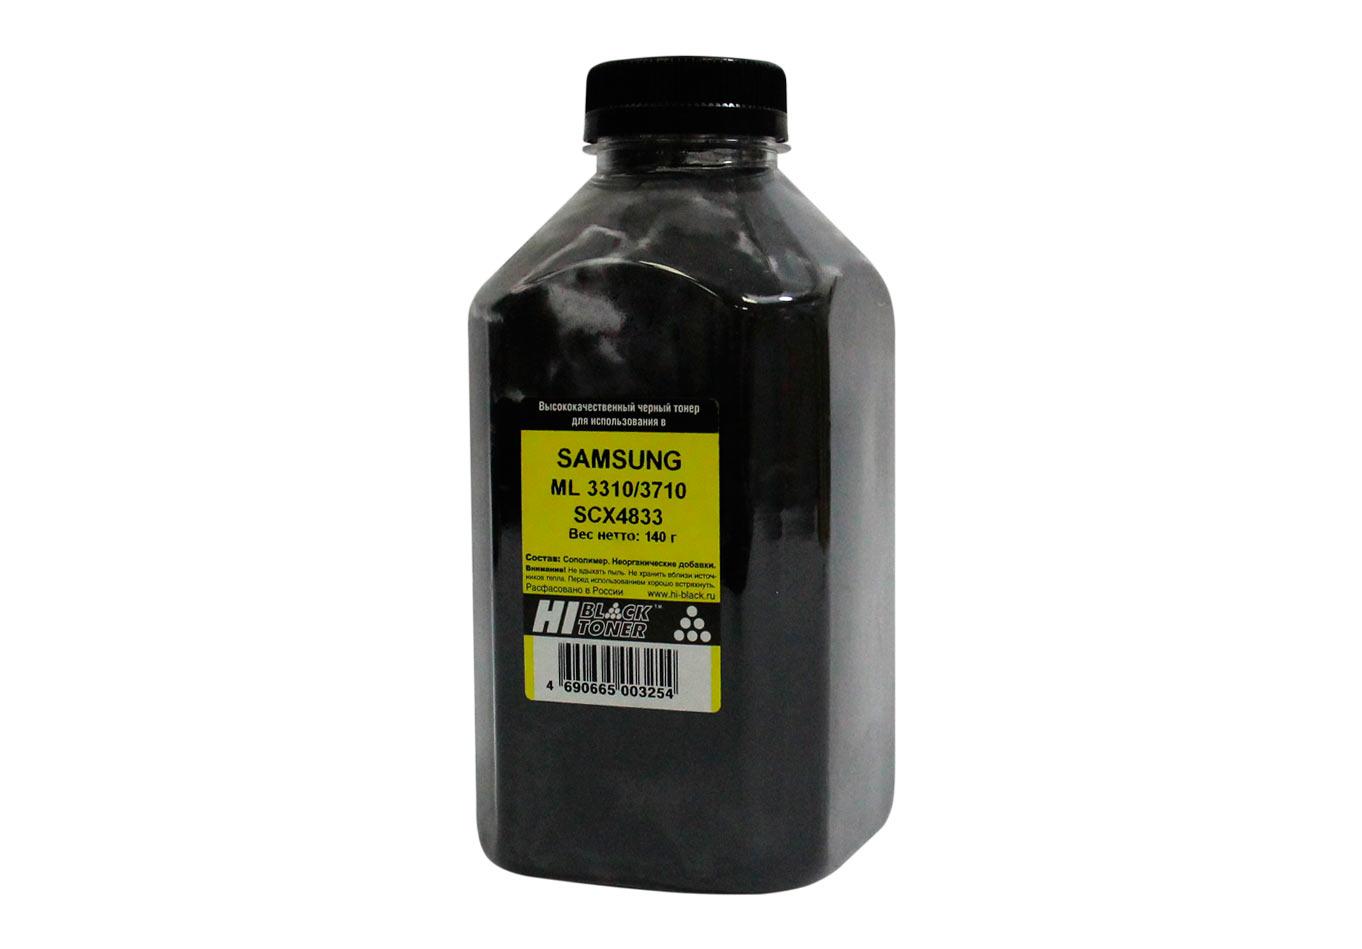 Тонер Hi-Black для Samsung ML-3310/3710/SCX-4833, Bk, 140 г, банка